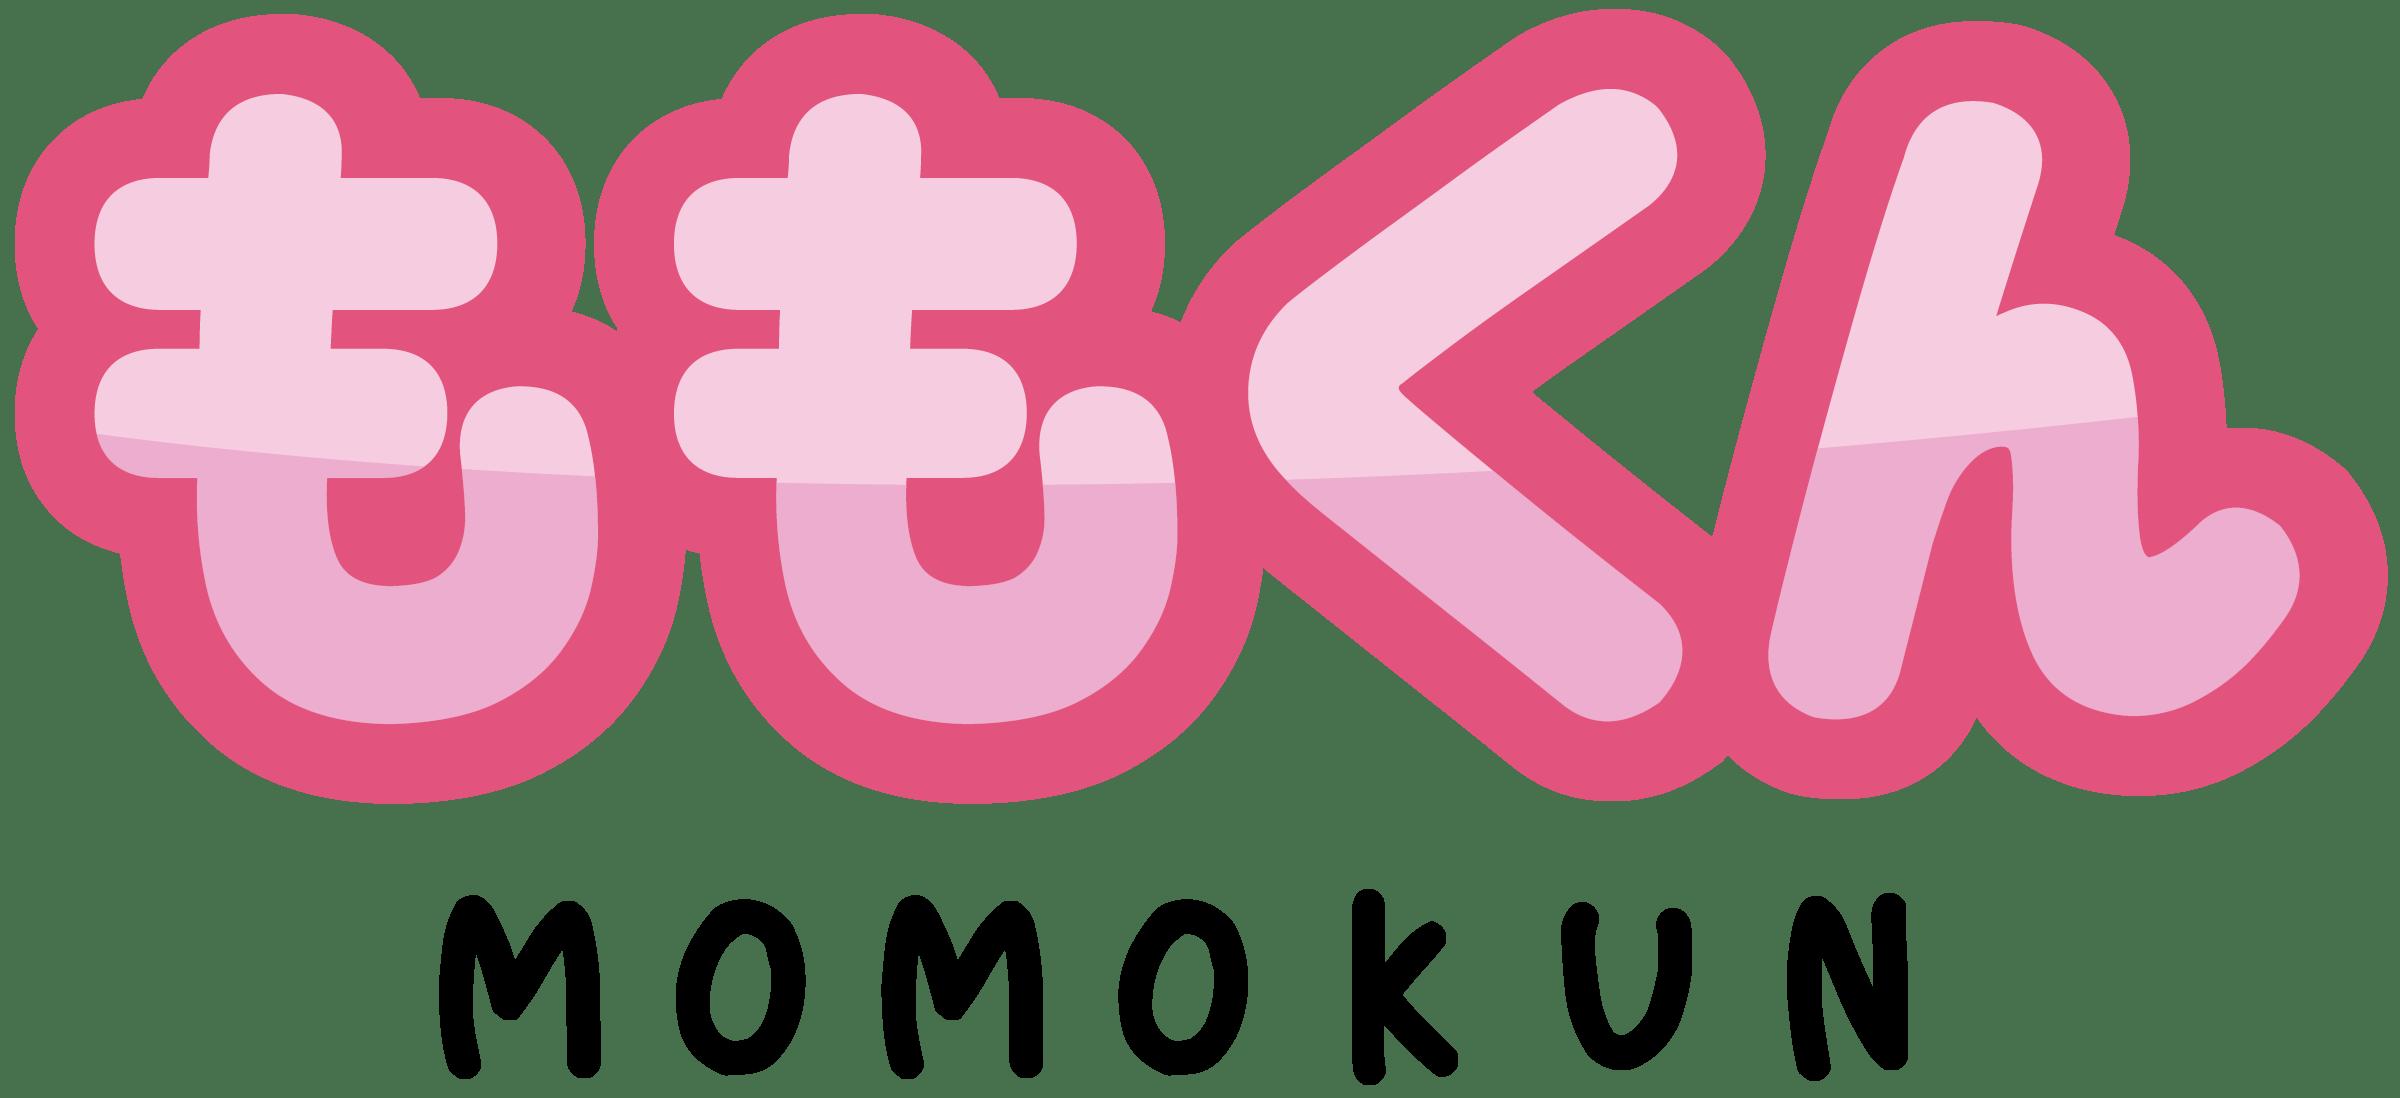 Momokun